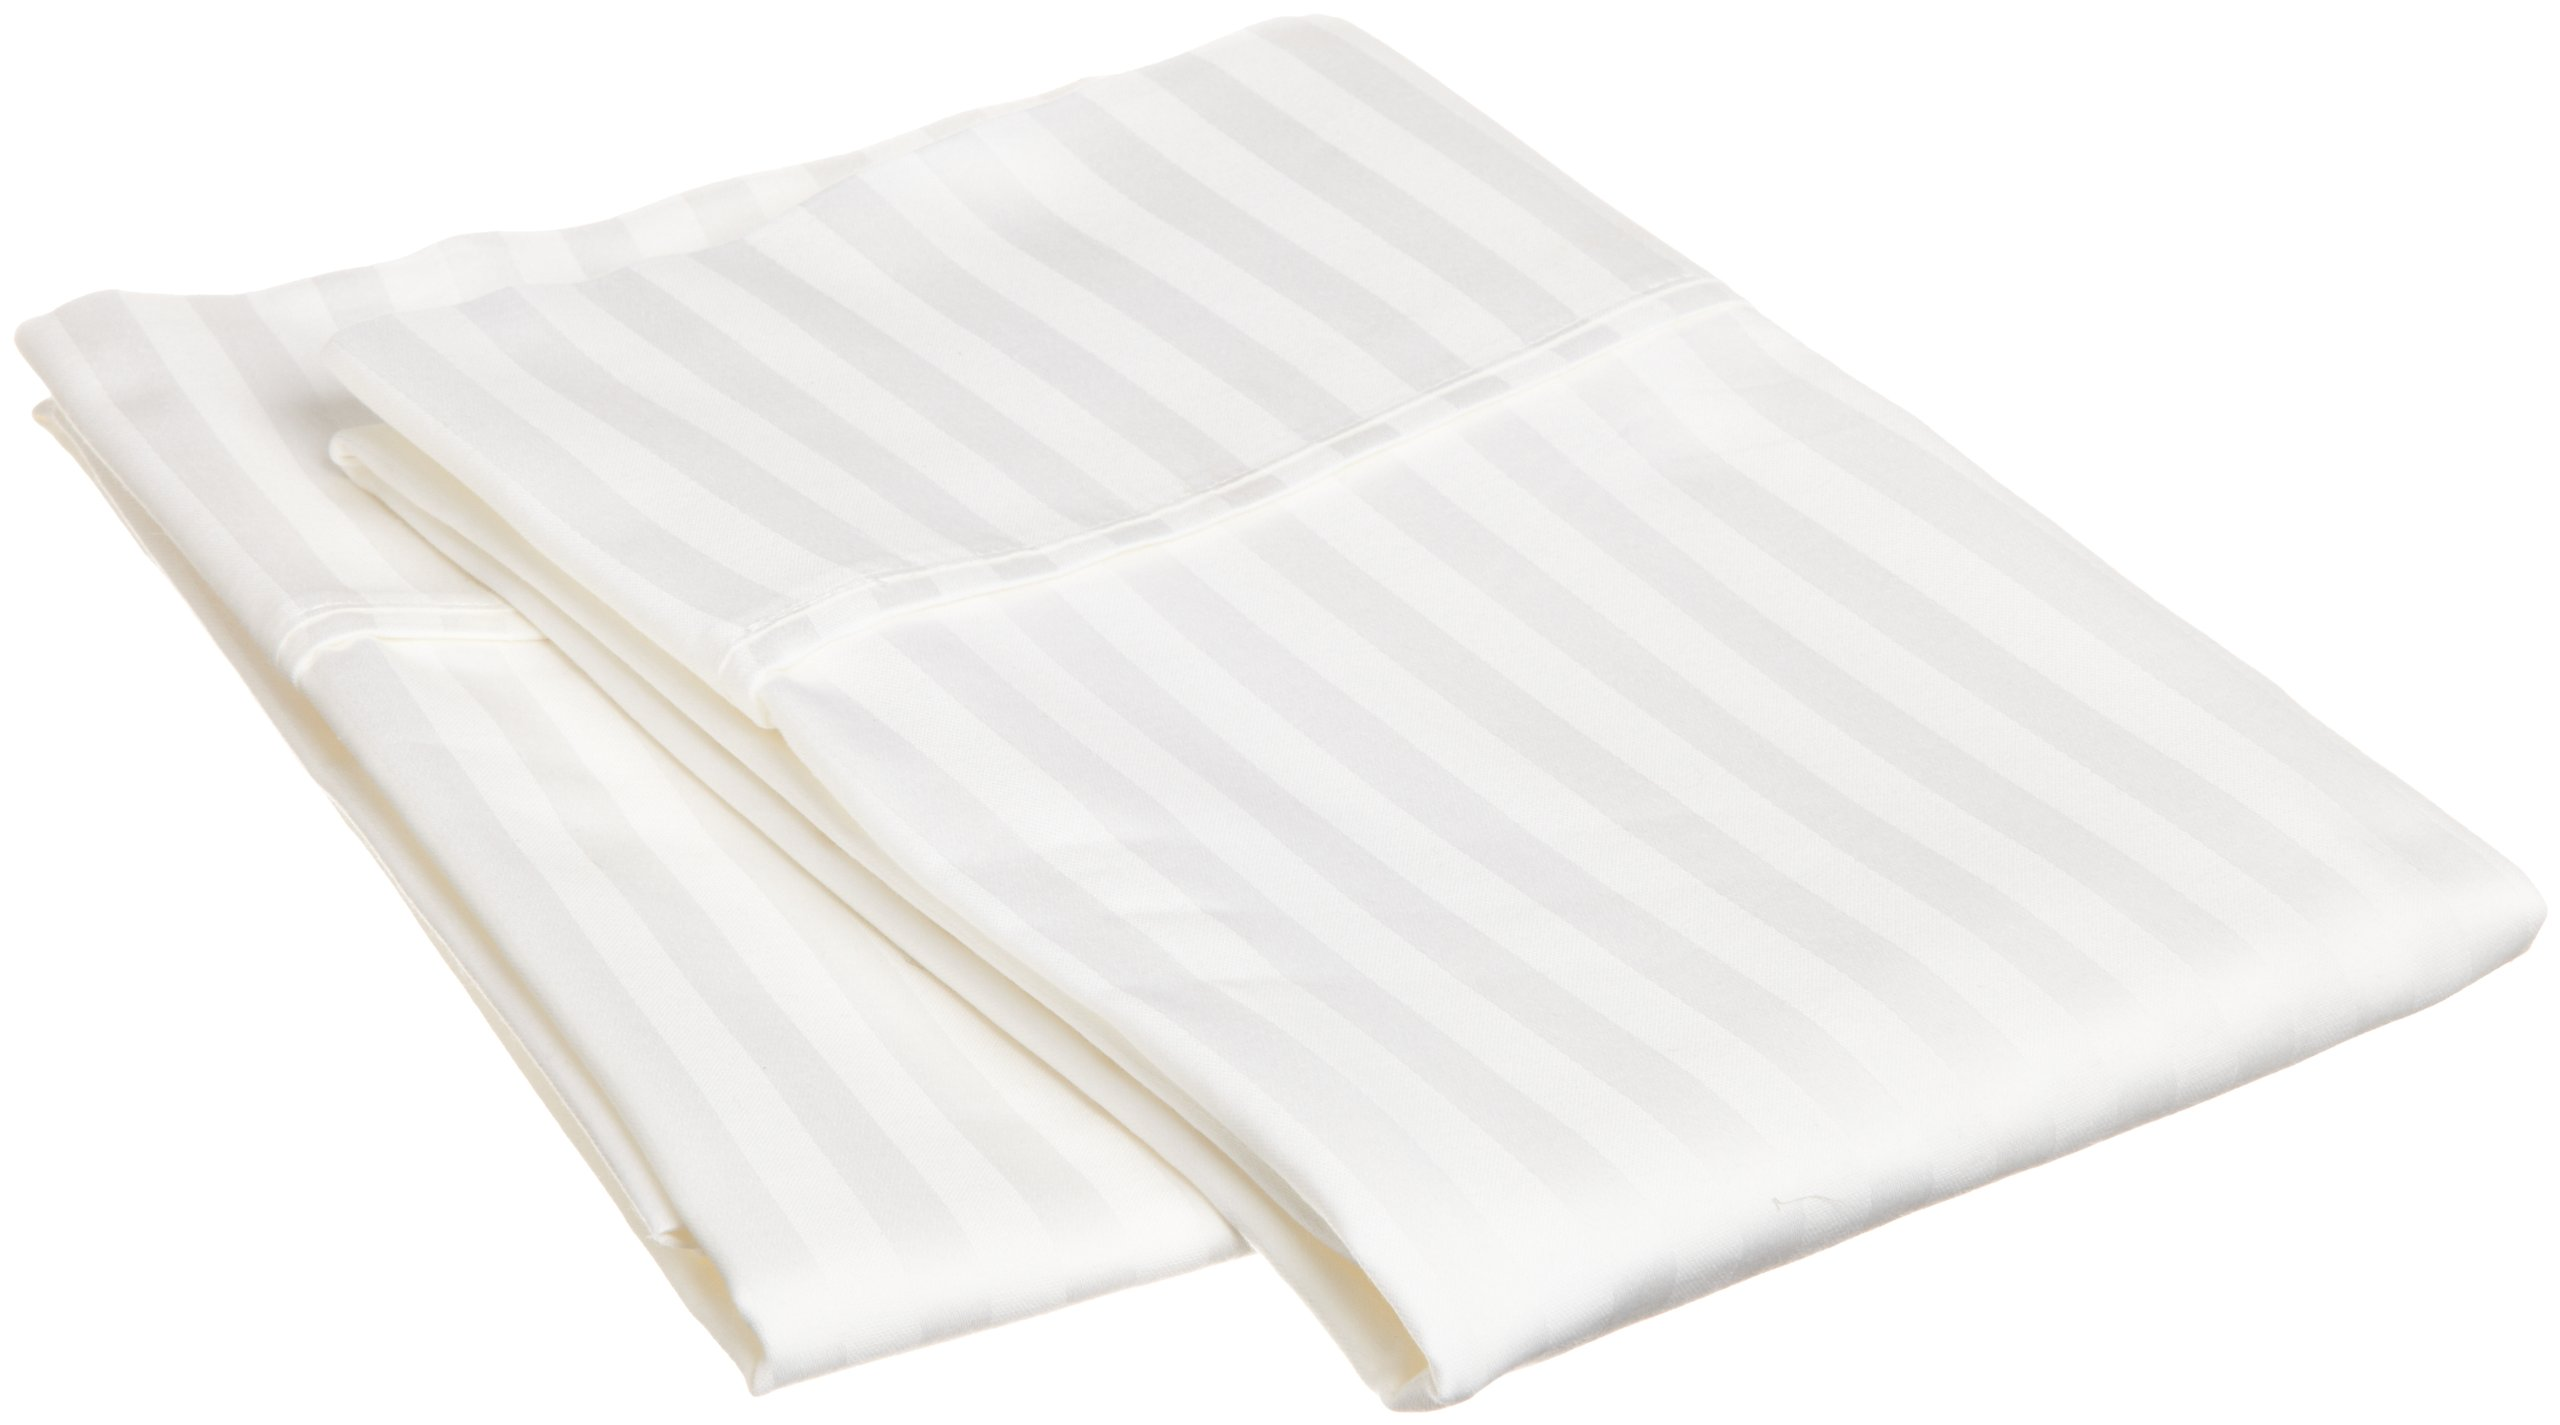 Superior 100% Premium Soft Combed Cotton Pillowcase Cover Pair, Sateen Stripes, King - White